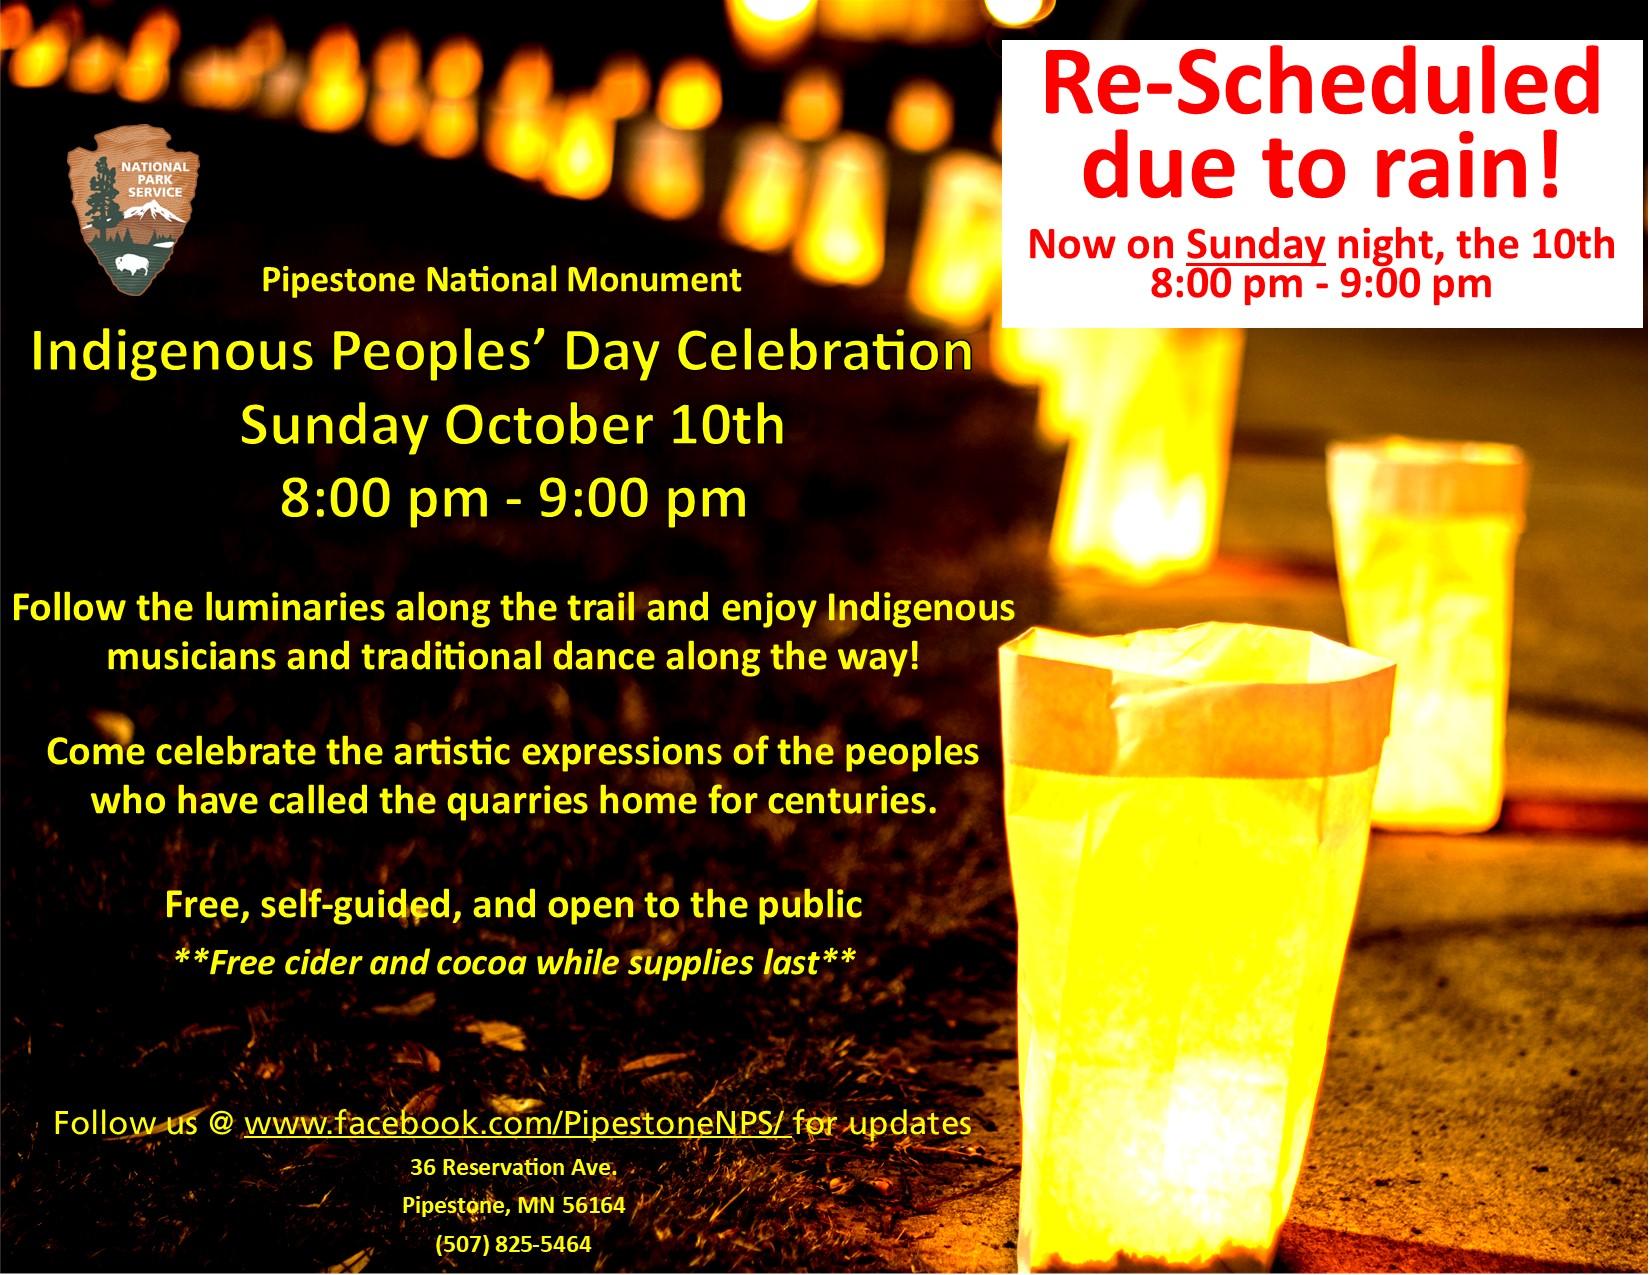 Indigenous Peoples' Day Celebration